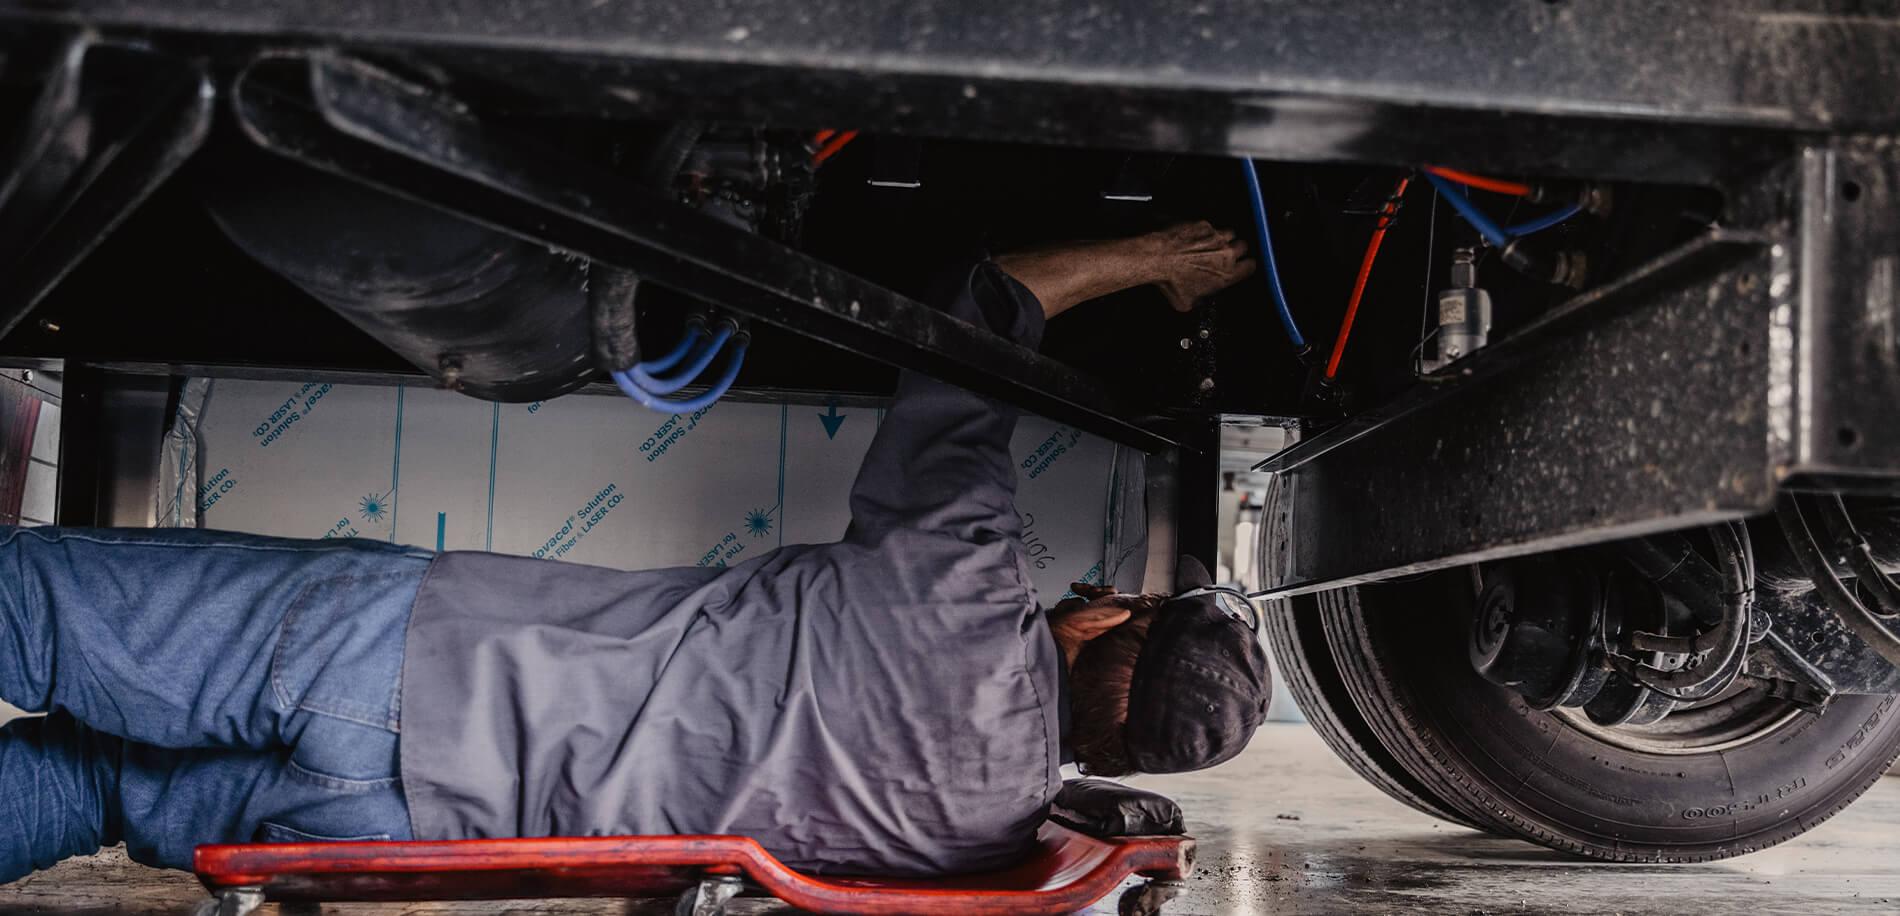 Alan_Reyes_The_Mechanic_Trailer_repair